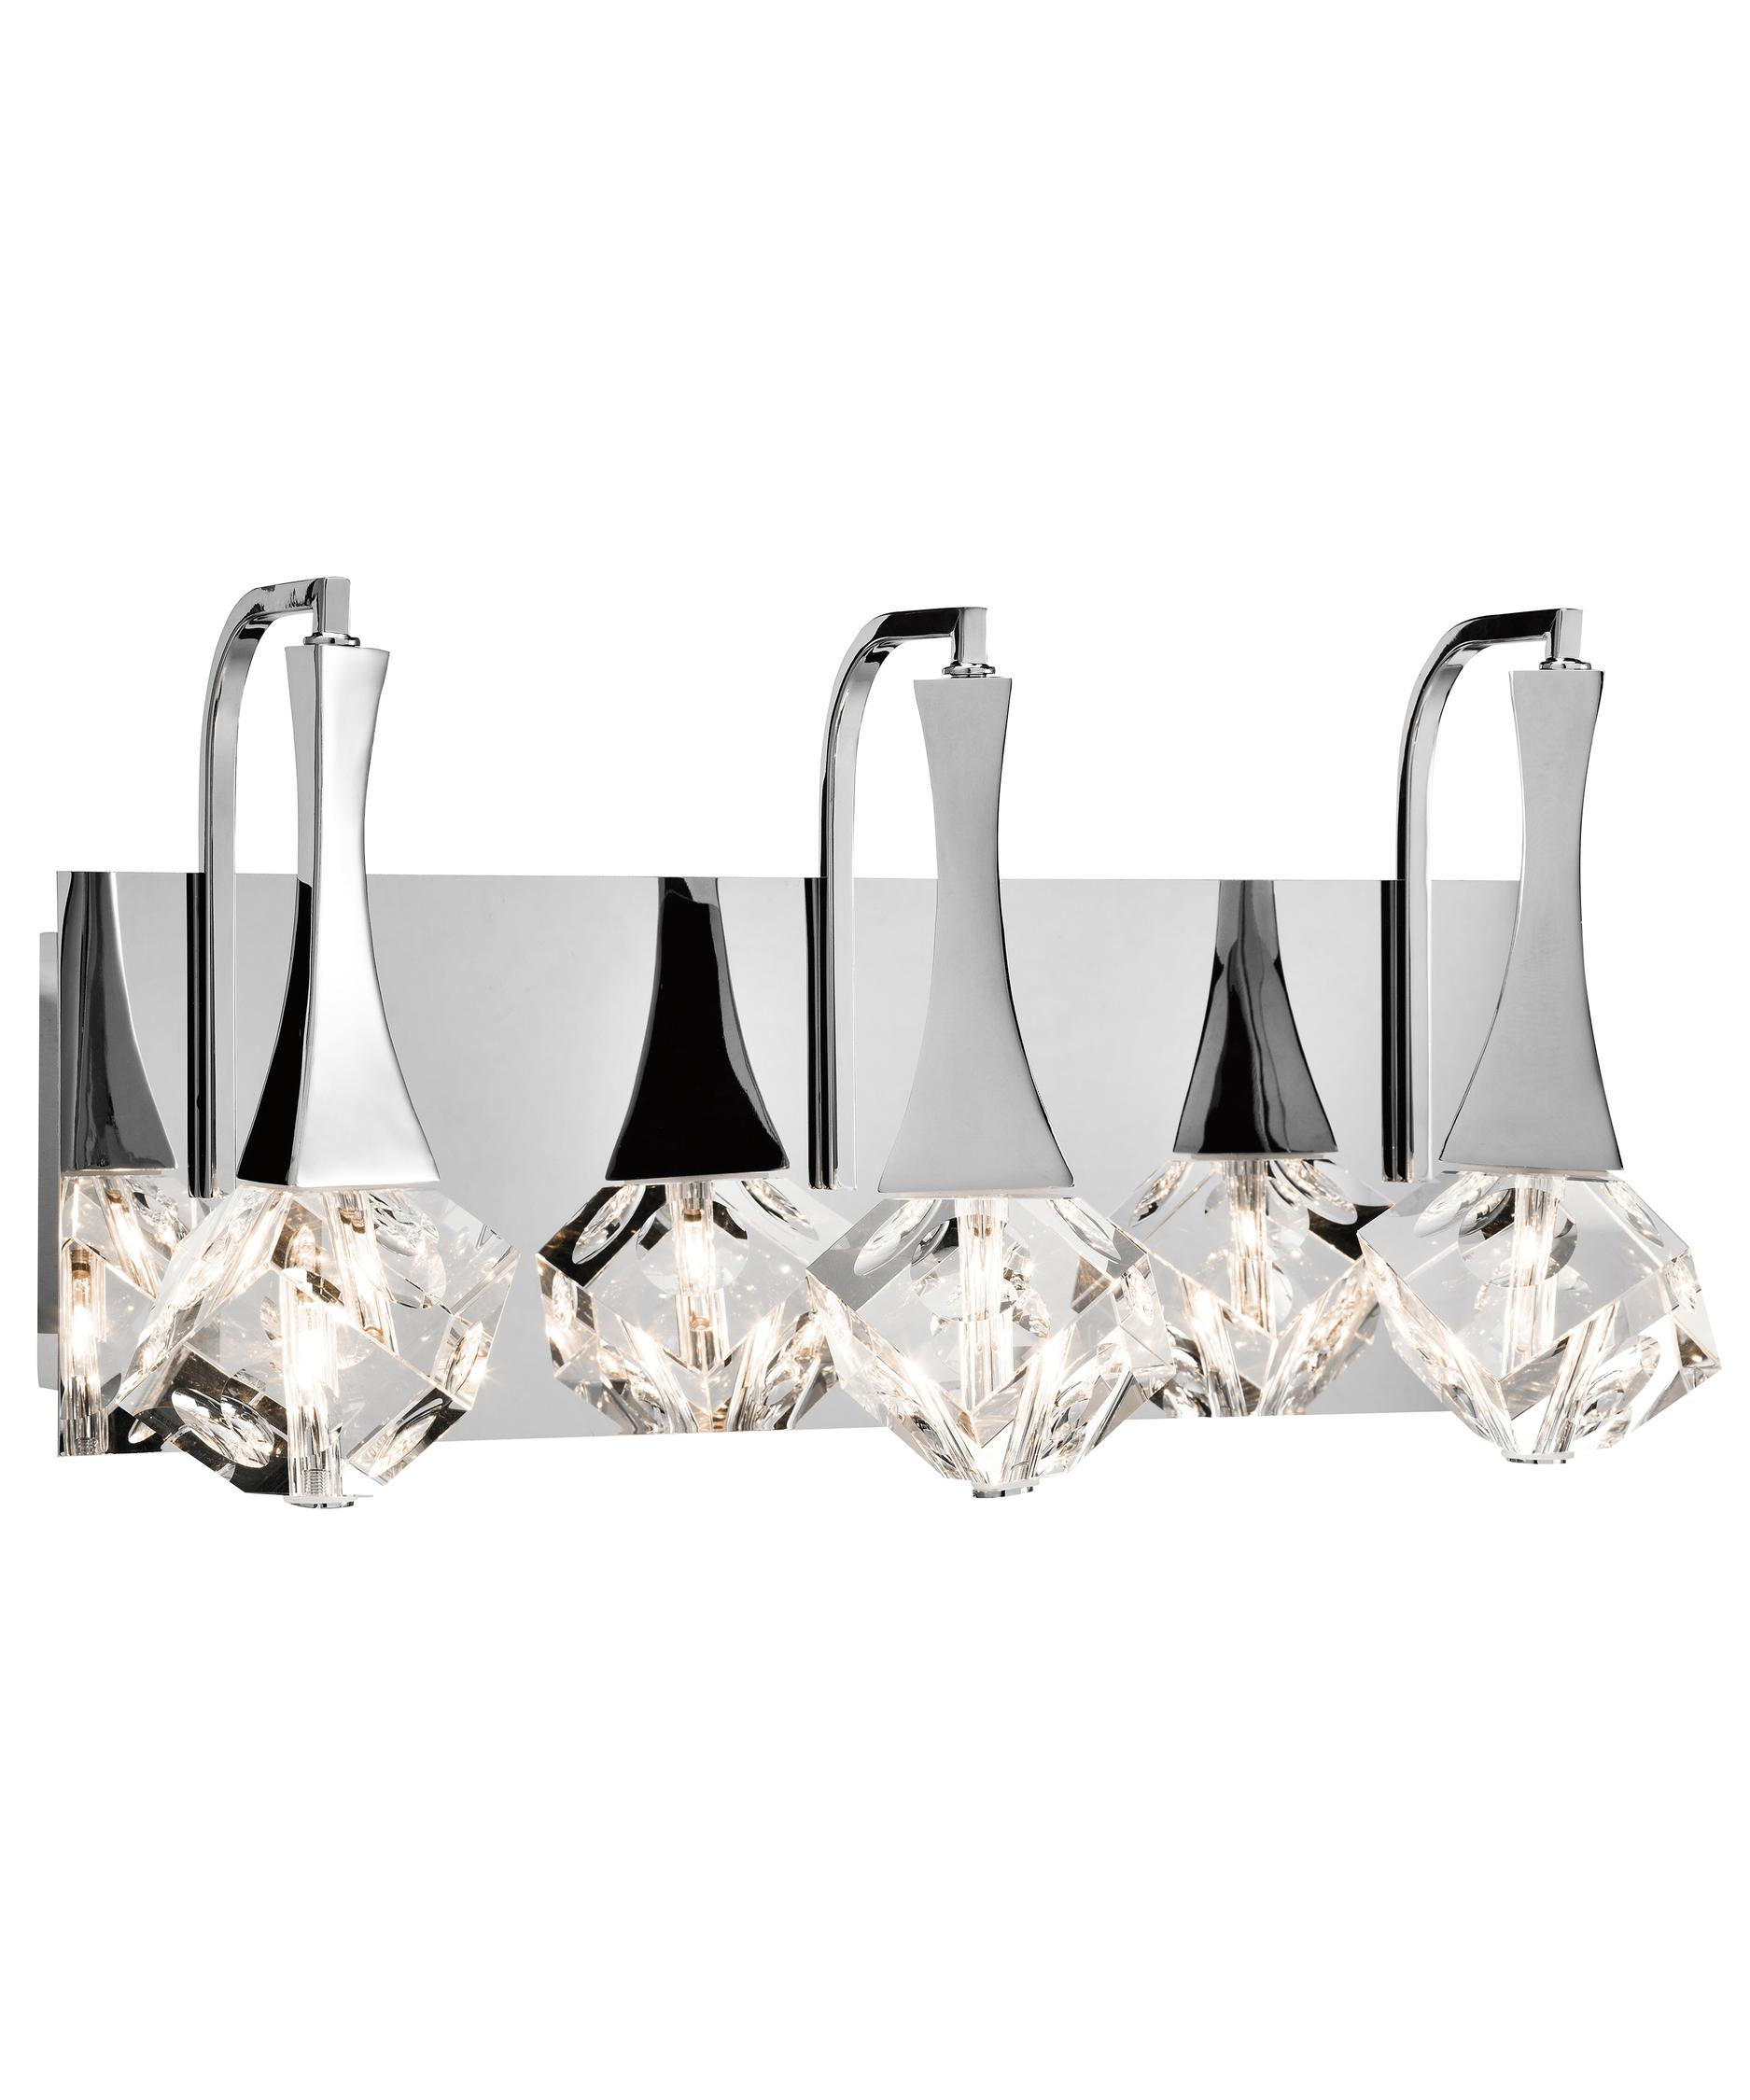 Bathroom Vanity Lights Chrome Finish elan 83136 rockne 18 inch wide bath vanity light | capitol